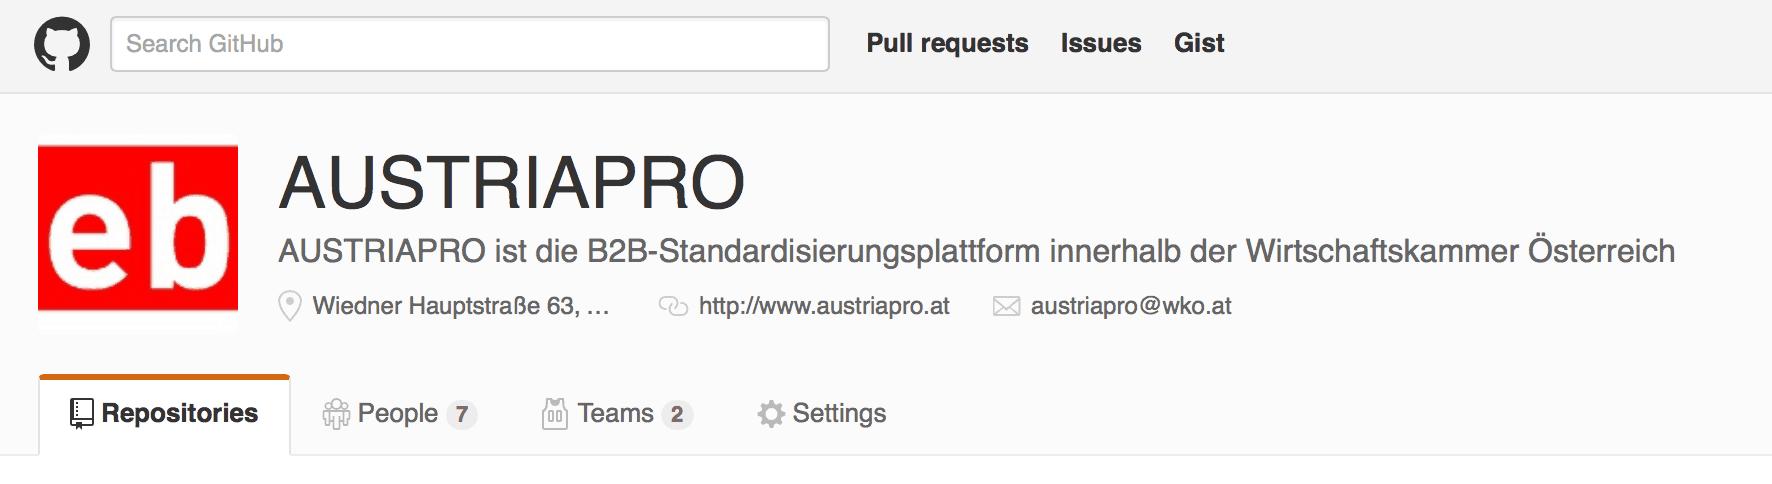 AUSTRIAPRO GitHub-Repository